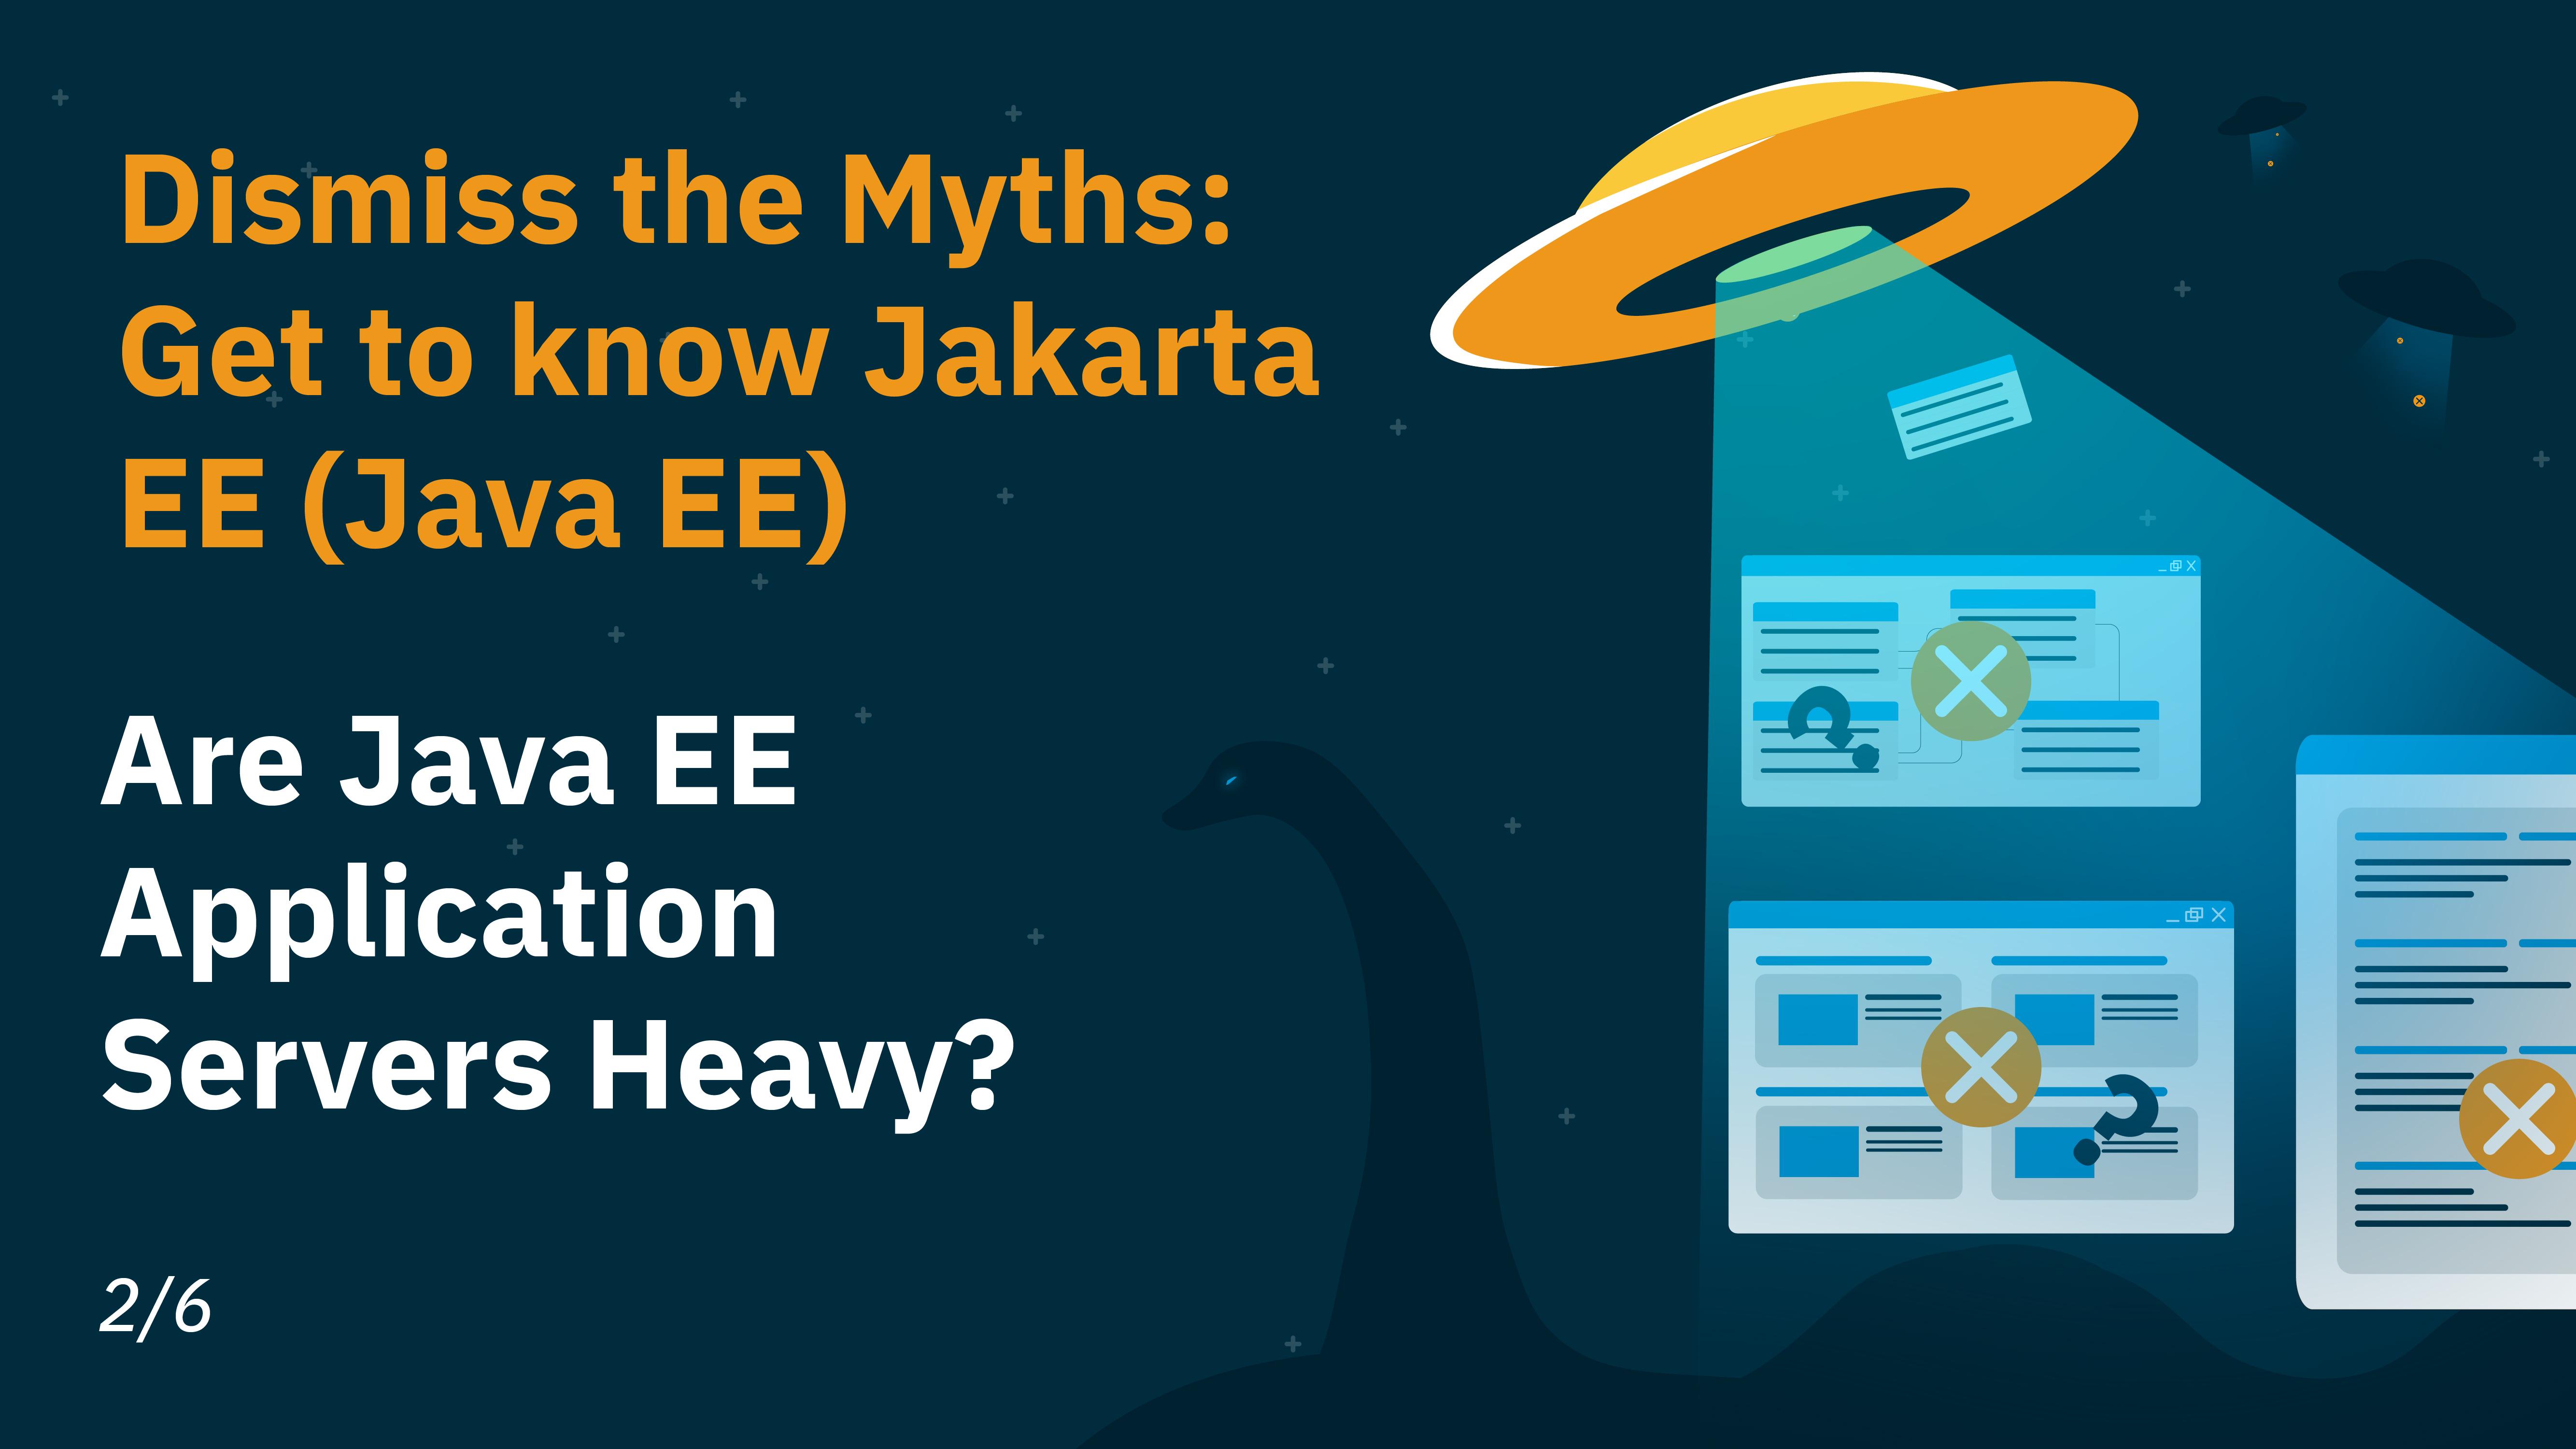 Java EE Application Servers Heavy